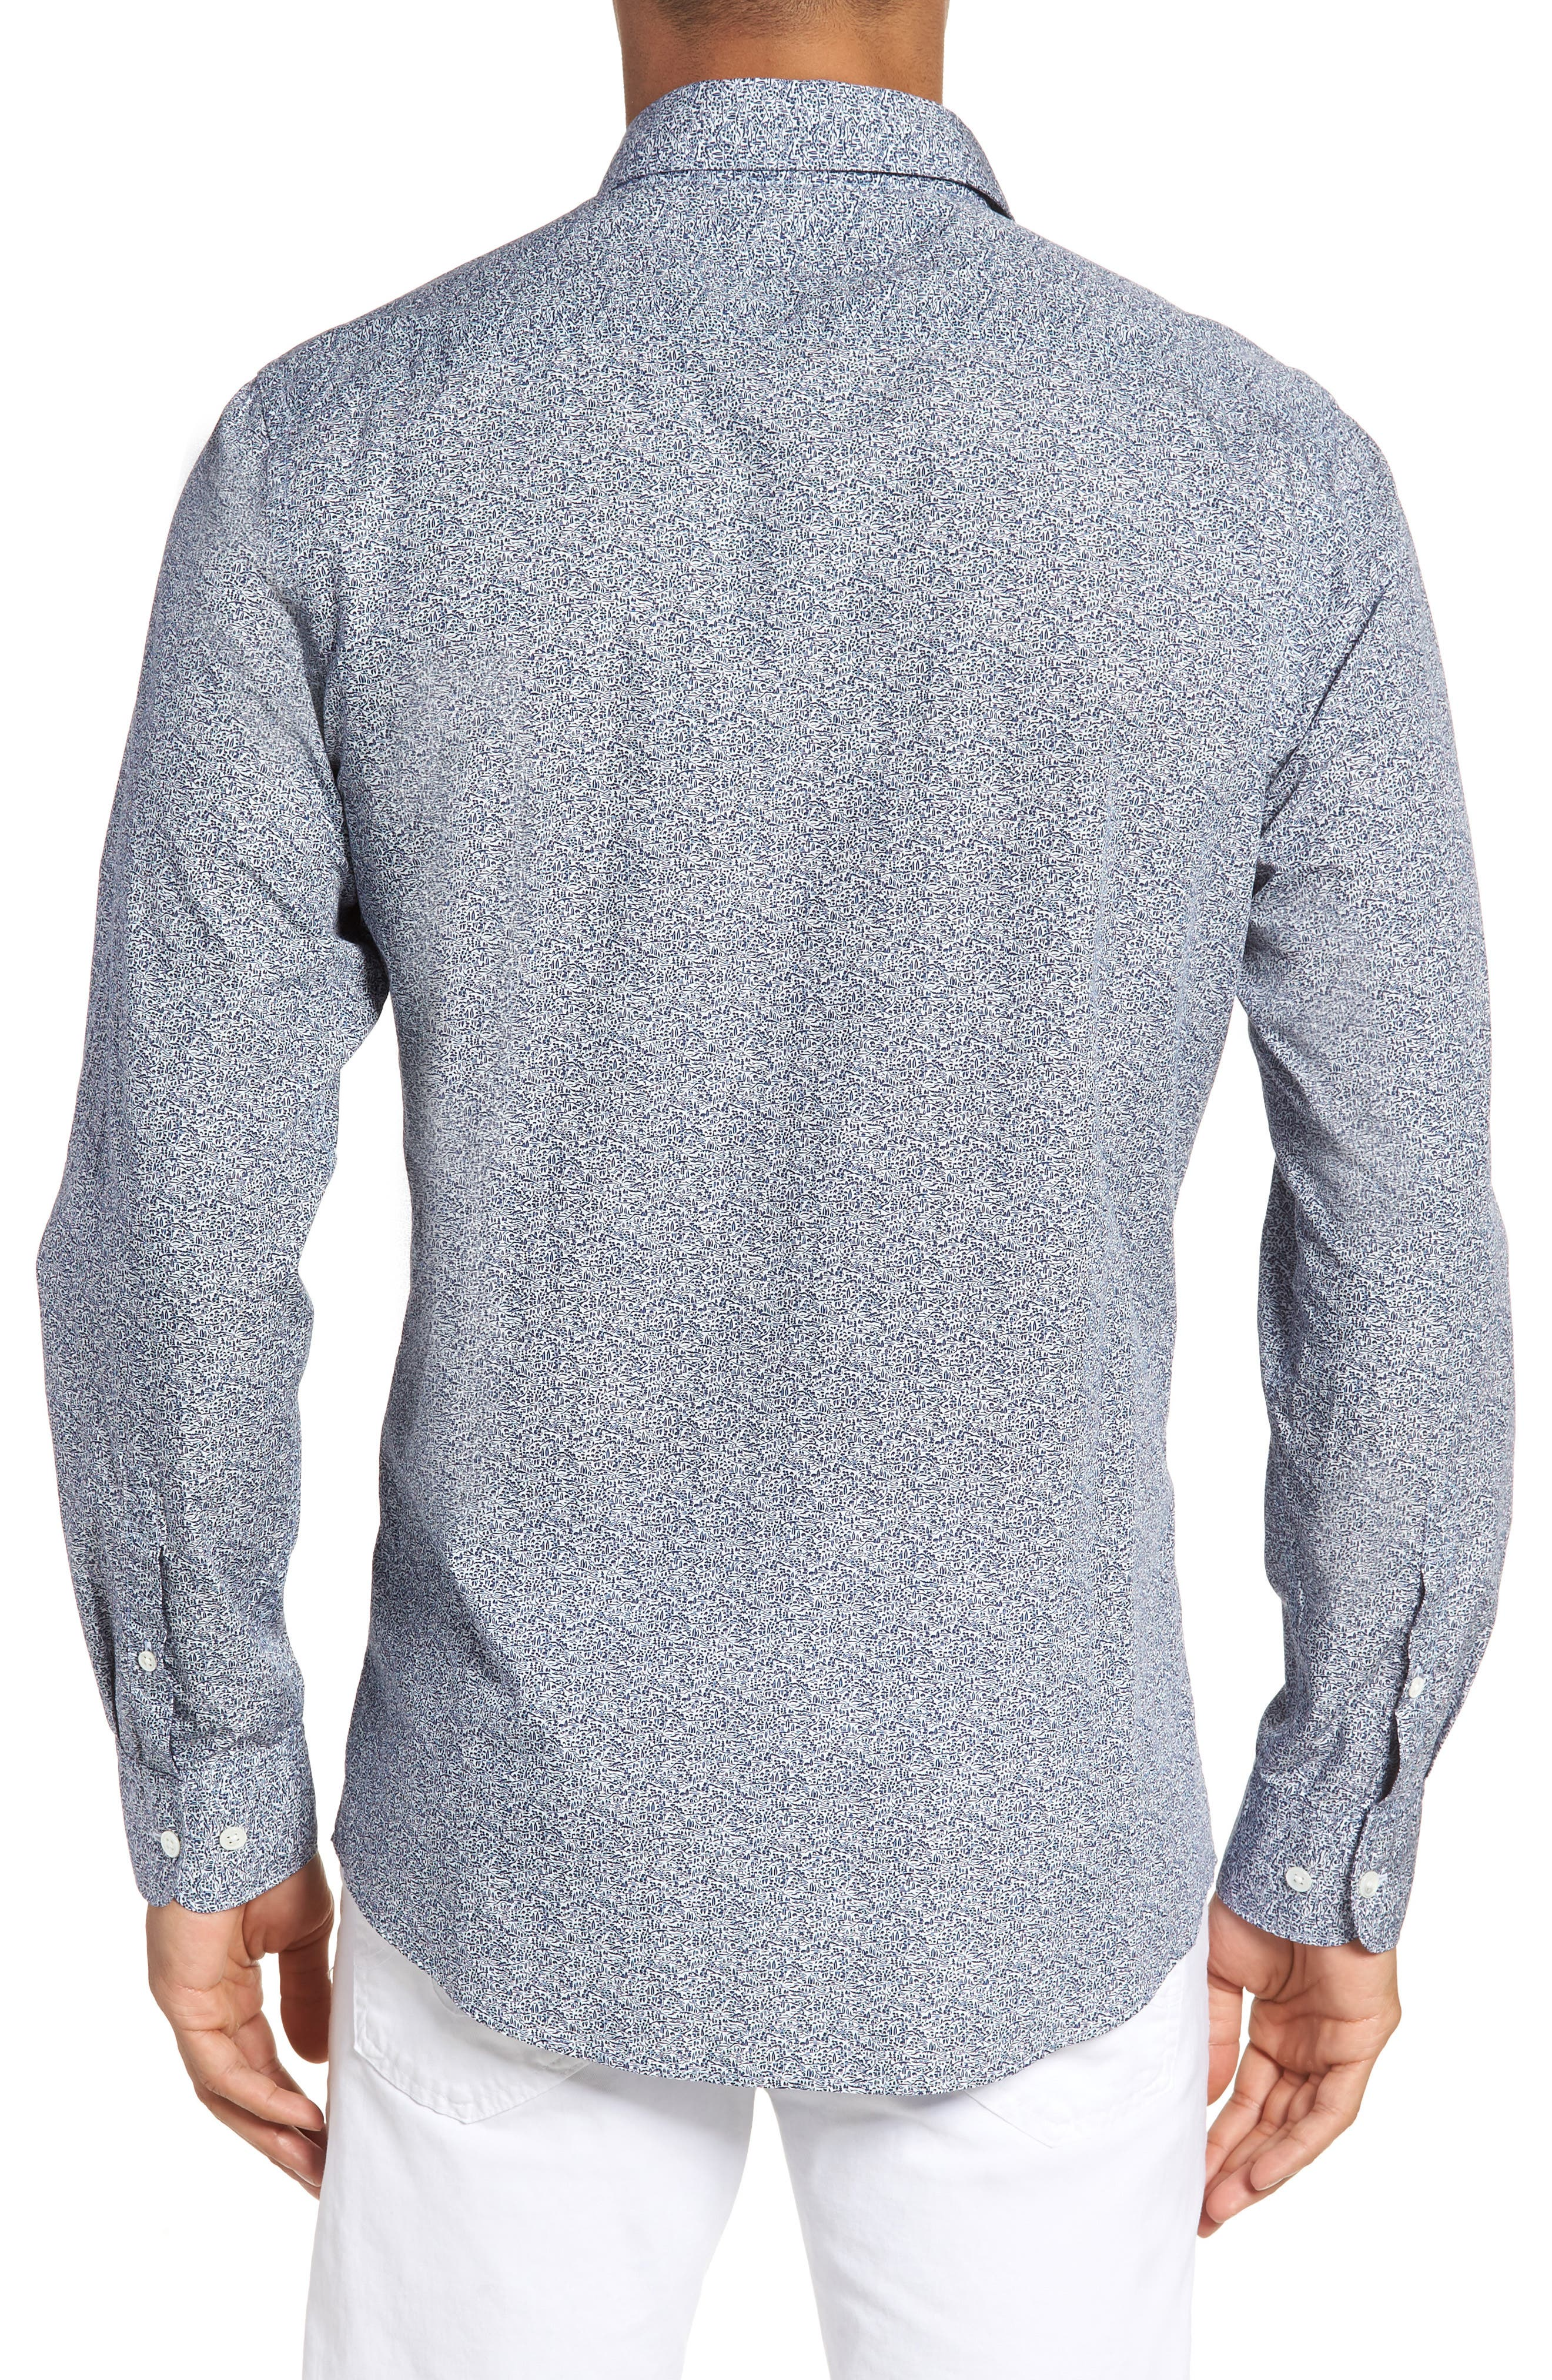 Massey West Slim Fit Sport Shirt,                             Alternate thumbnail 3, color,                             Ink